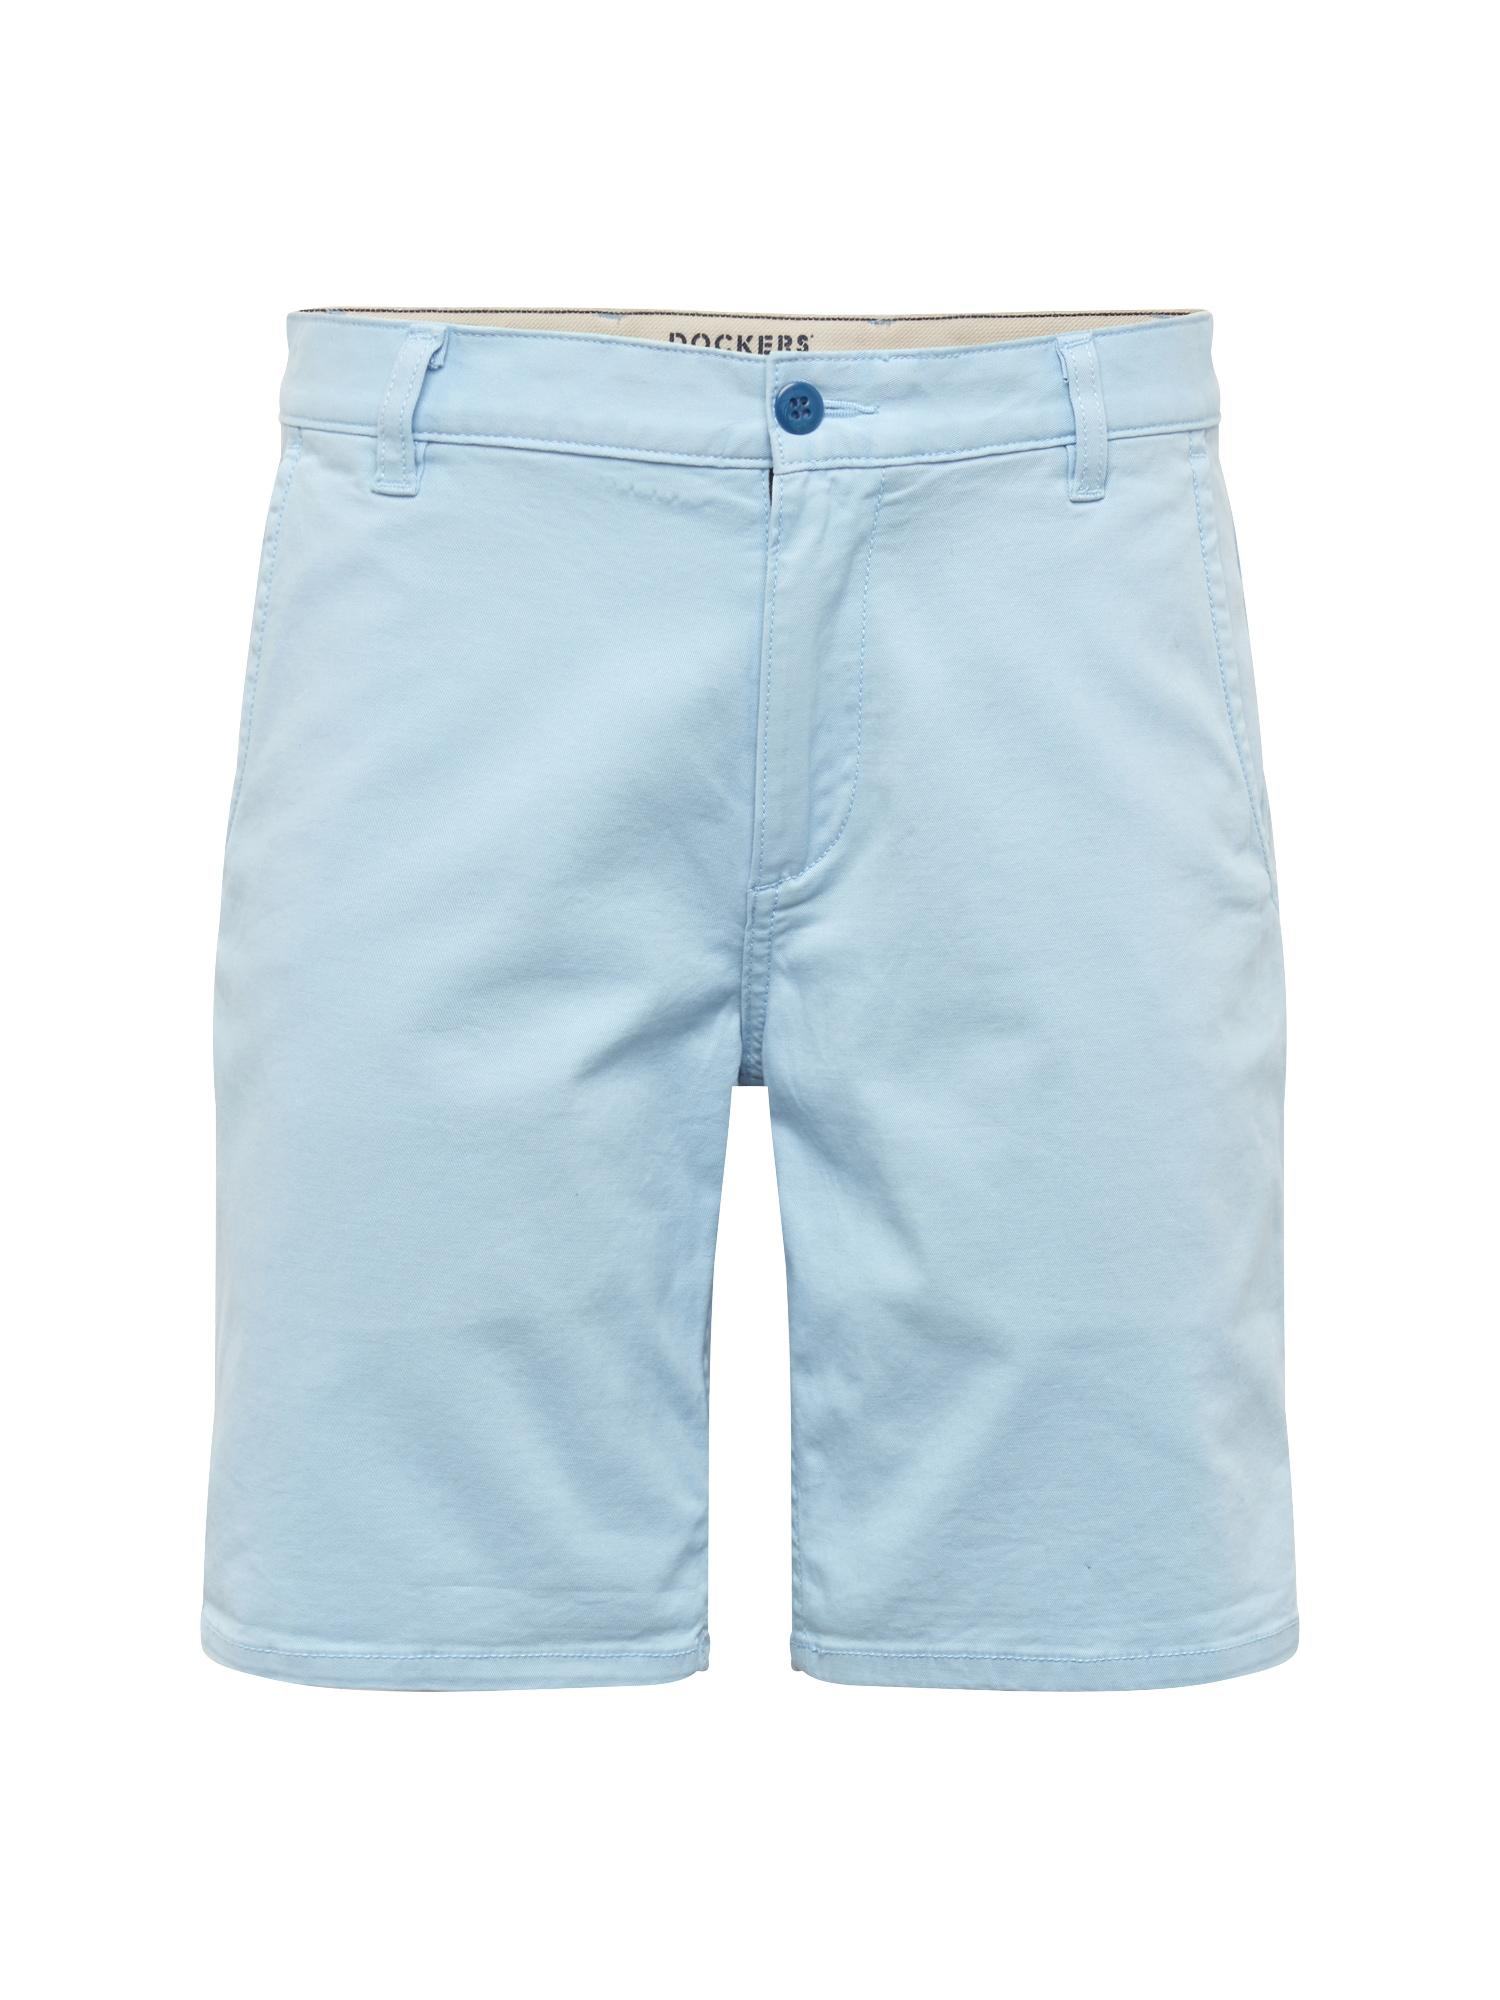 Chino kalhoty ALPHA SHORT - STRETCH TWILL světlemodrá Dockers